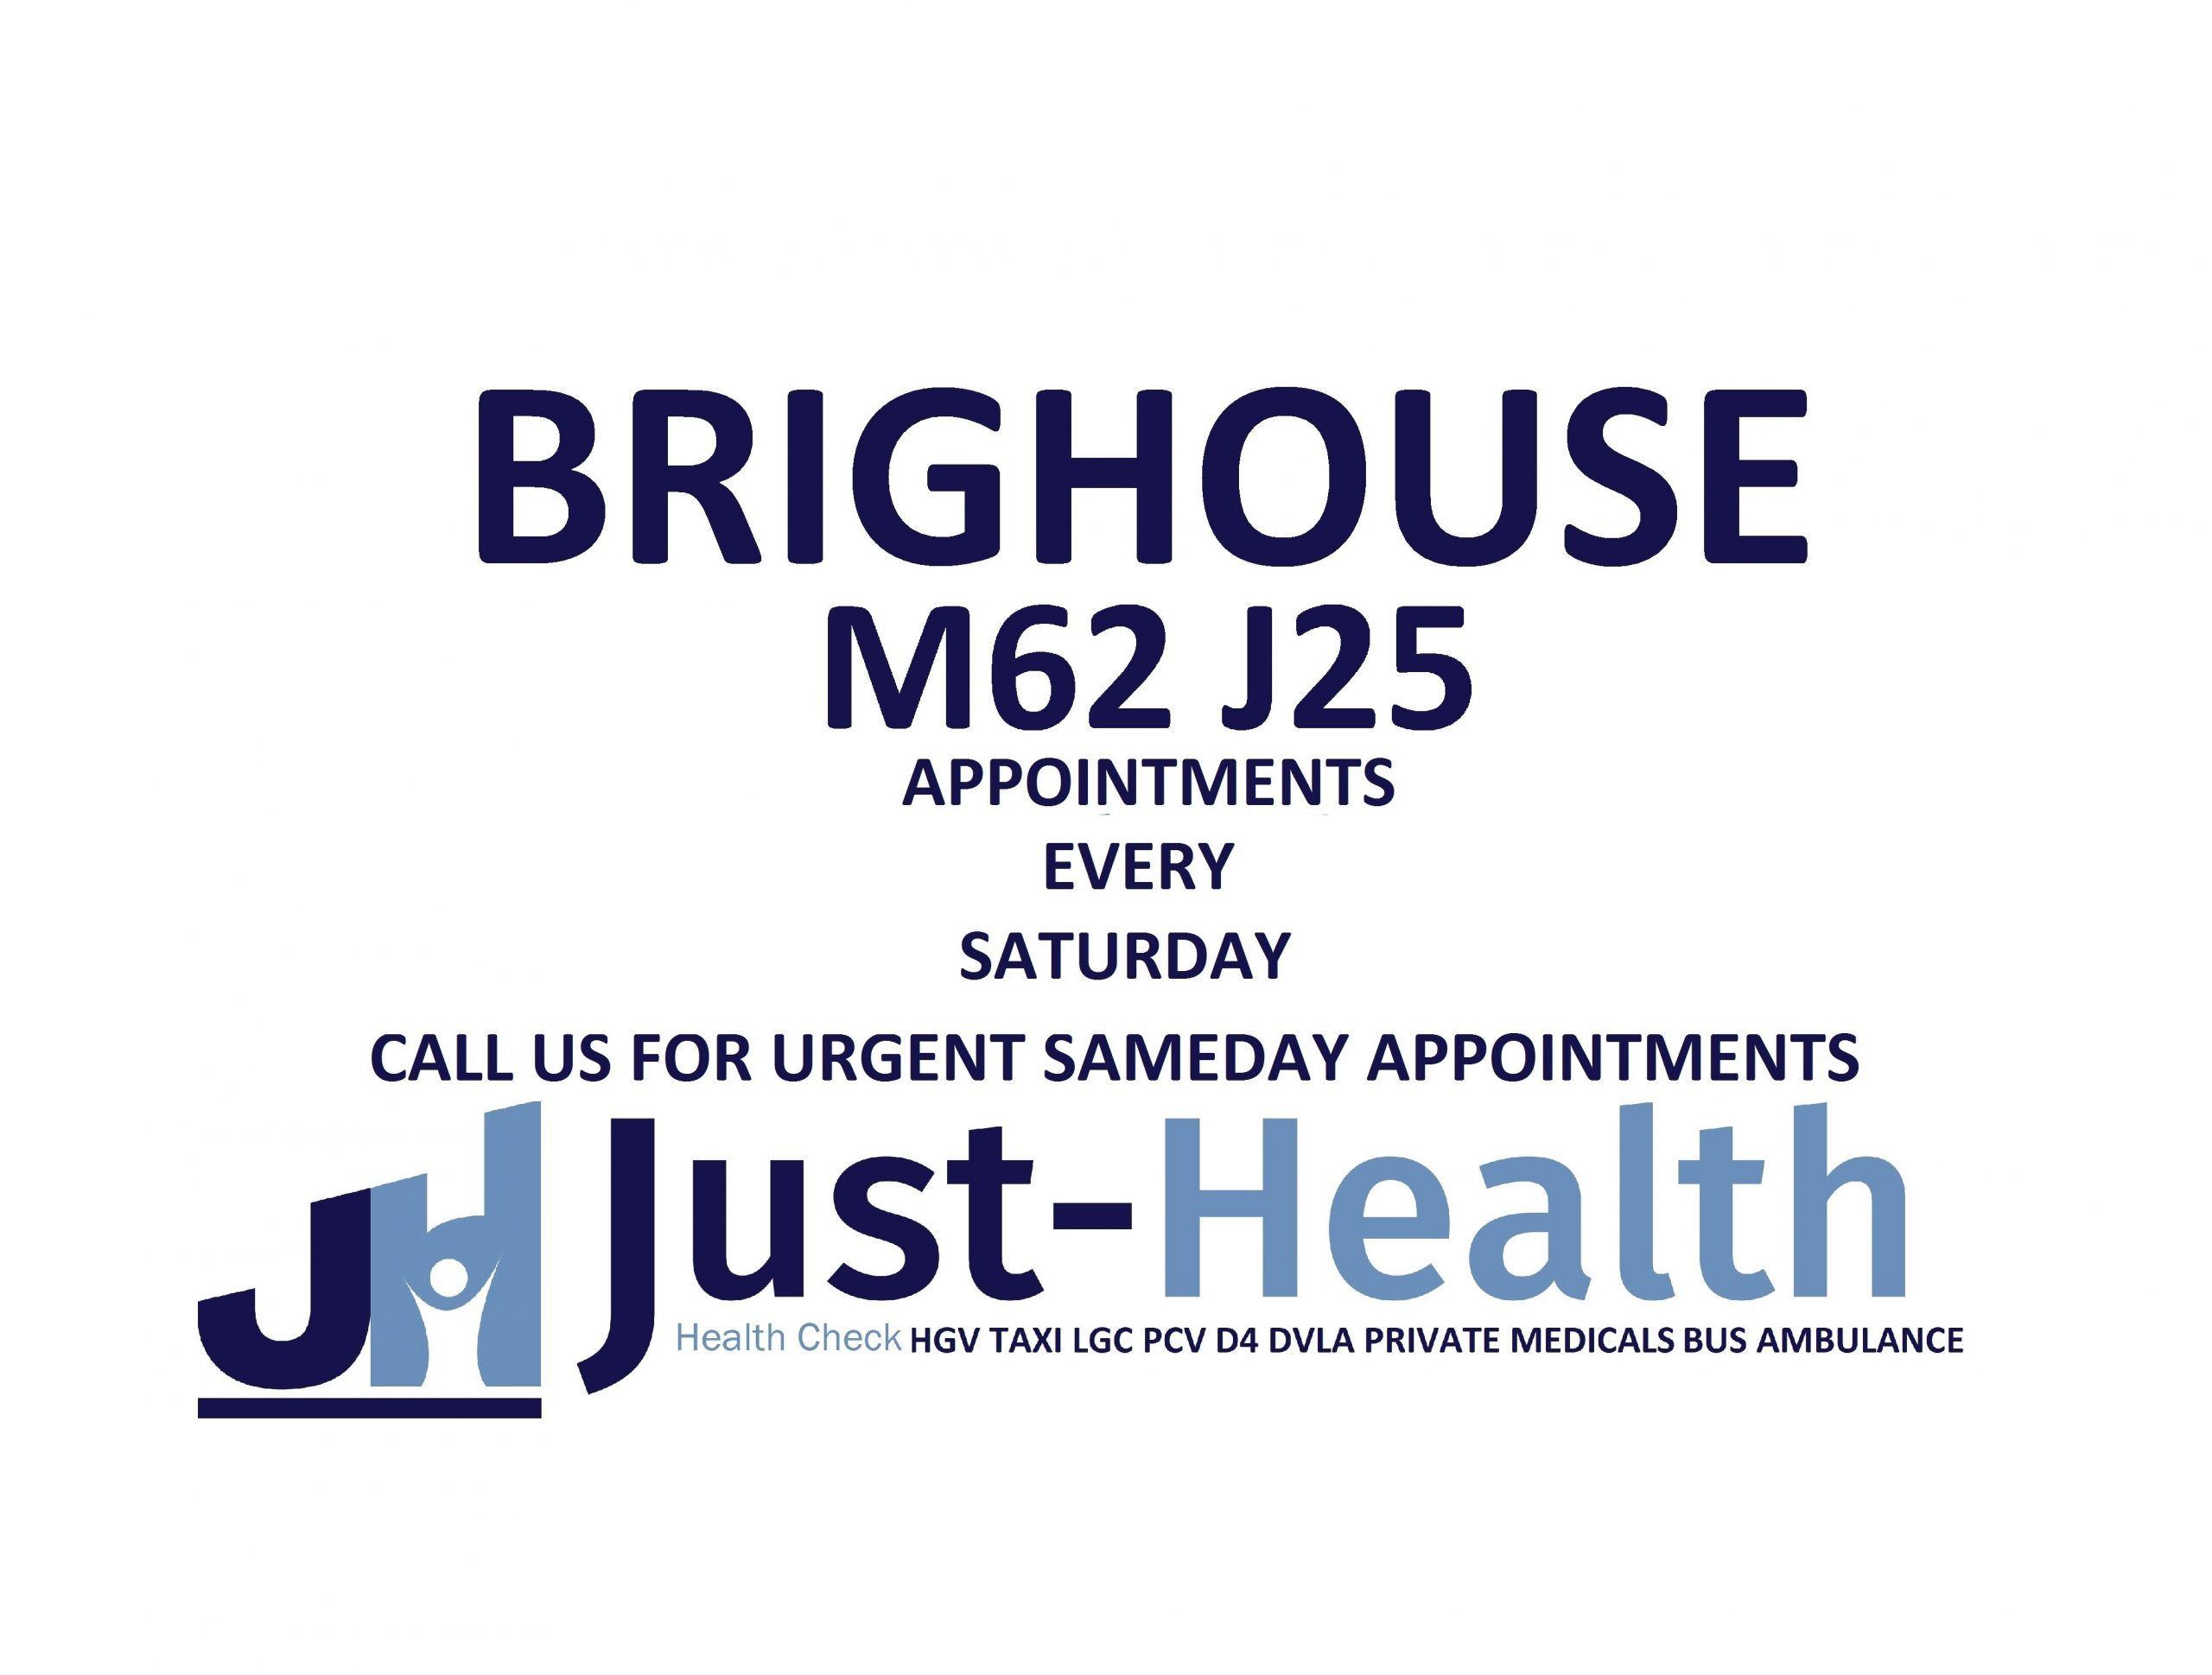 BRIGHOUSE yorkshire huddersfield hgv medical just health